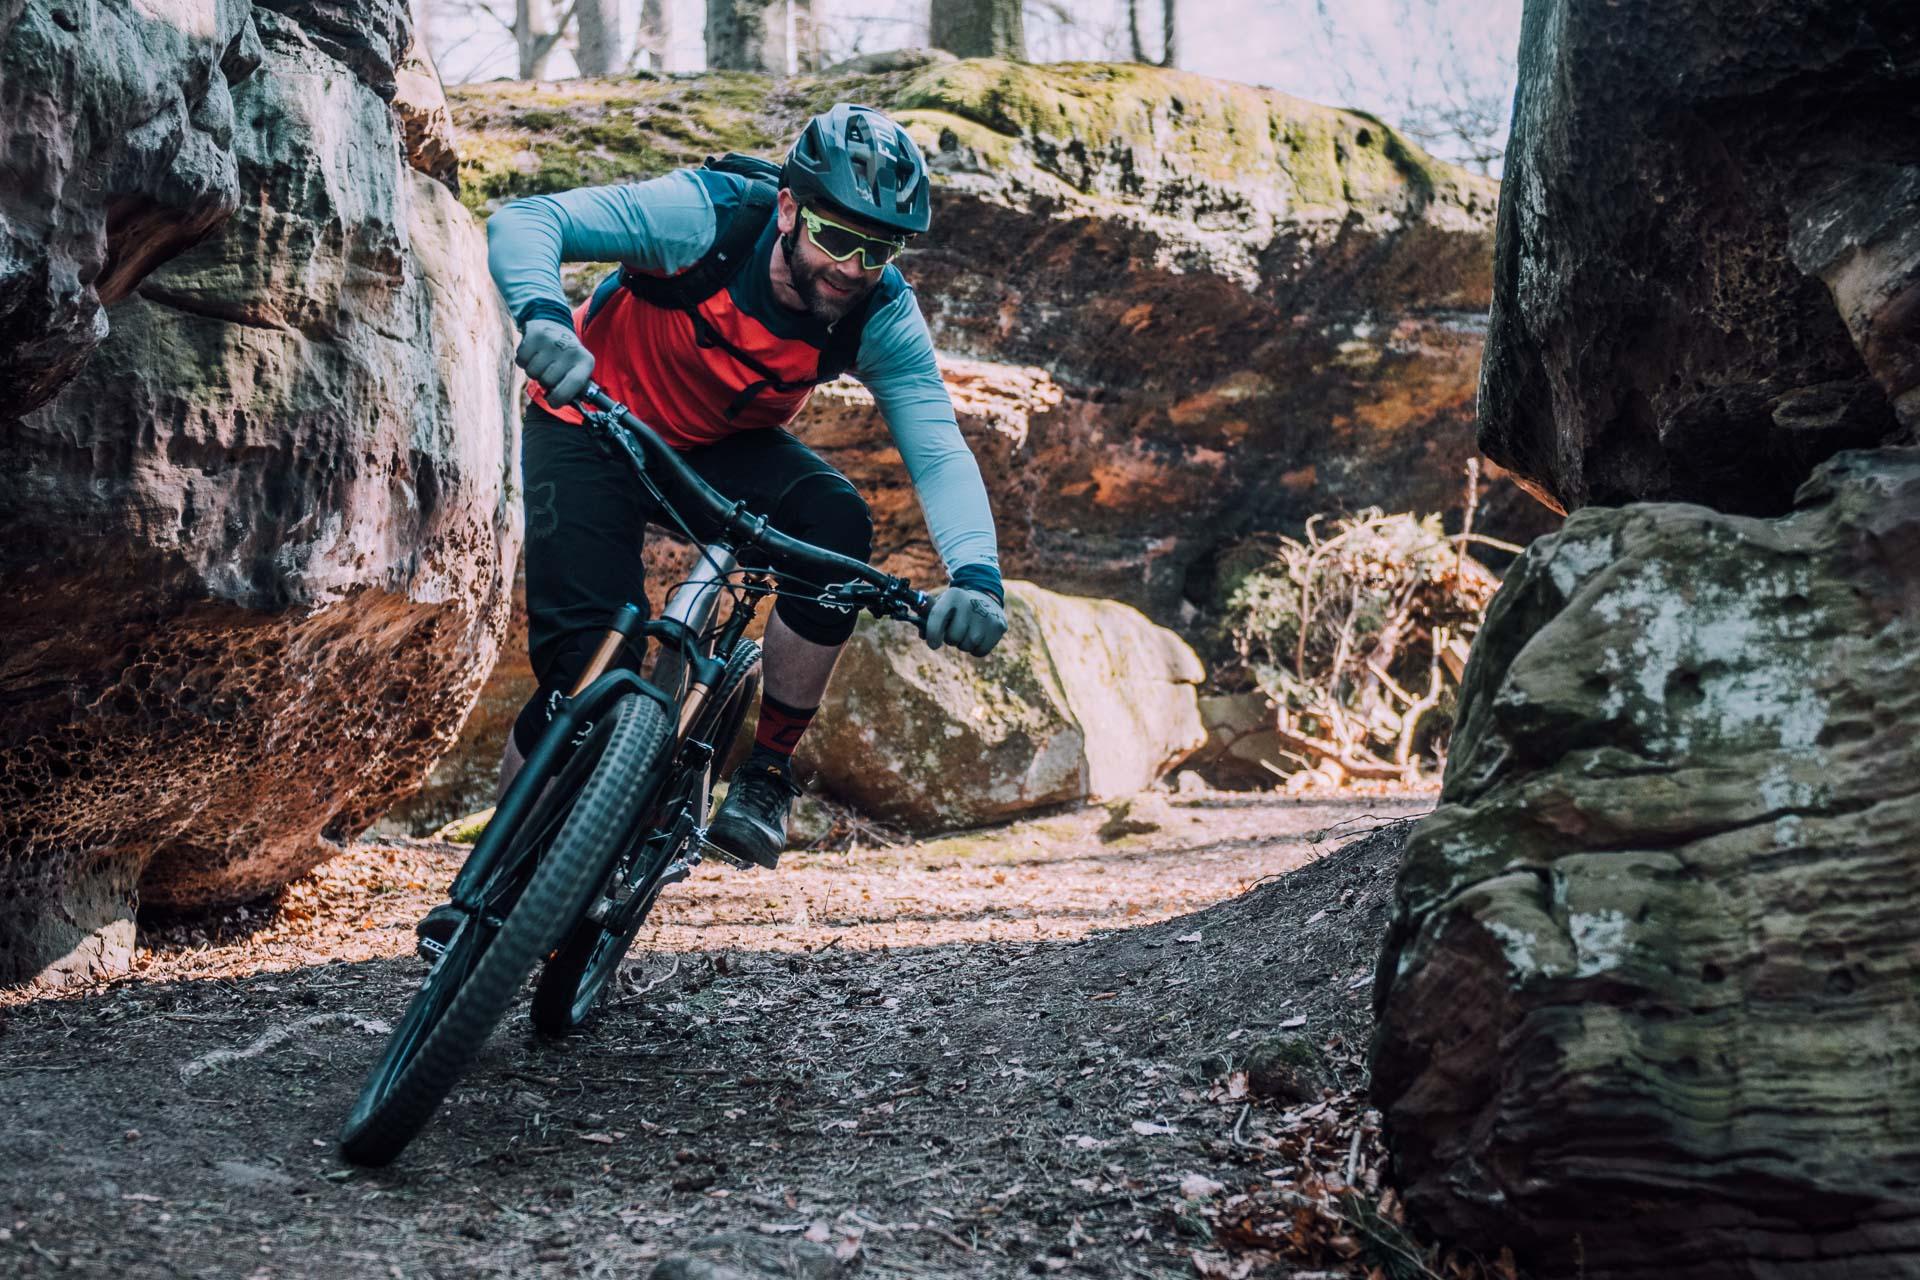 mountainbiker fährt eine enge kurve